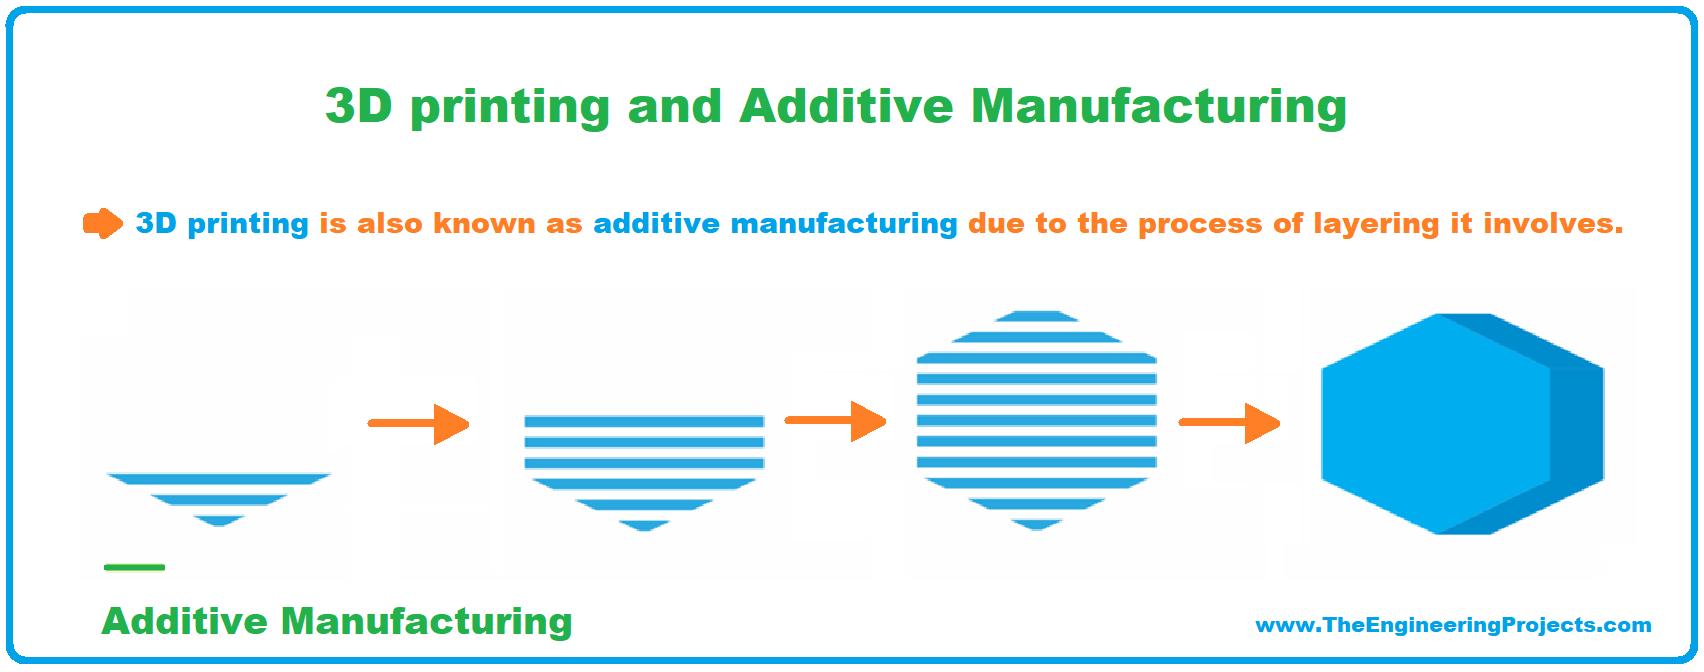 3D Printing, 3D Printer, 3D Printing definition, What is 3D Printing, Definition of 3D printing, 3D Printing Technology, Process of 3D printing, Applications of 3D Printing, 3D Printing examples, 3D Printing advantages